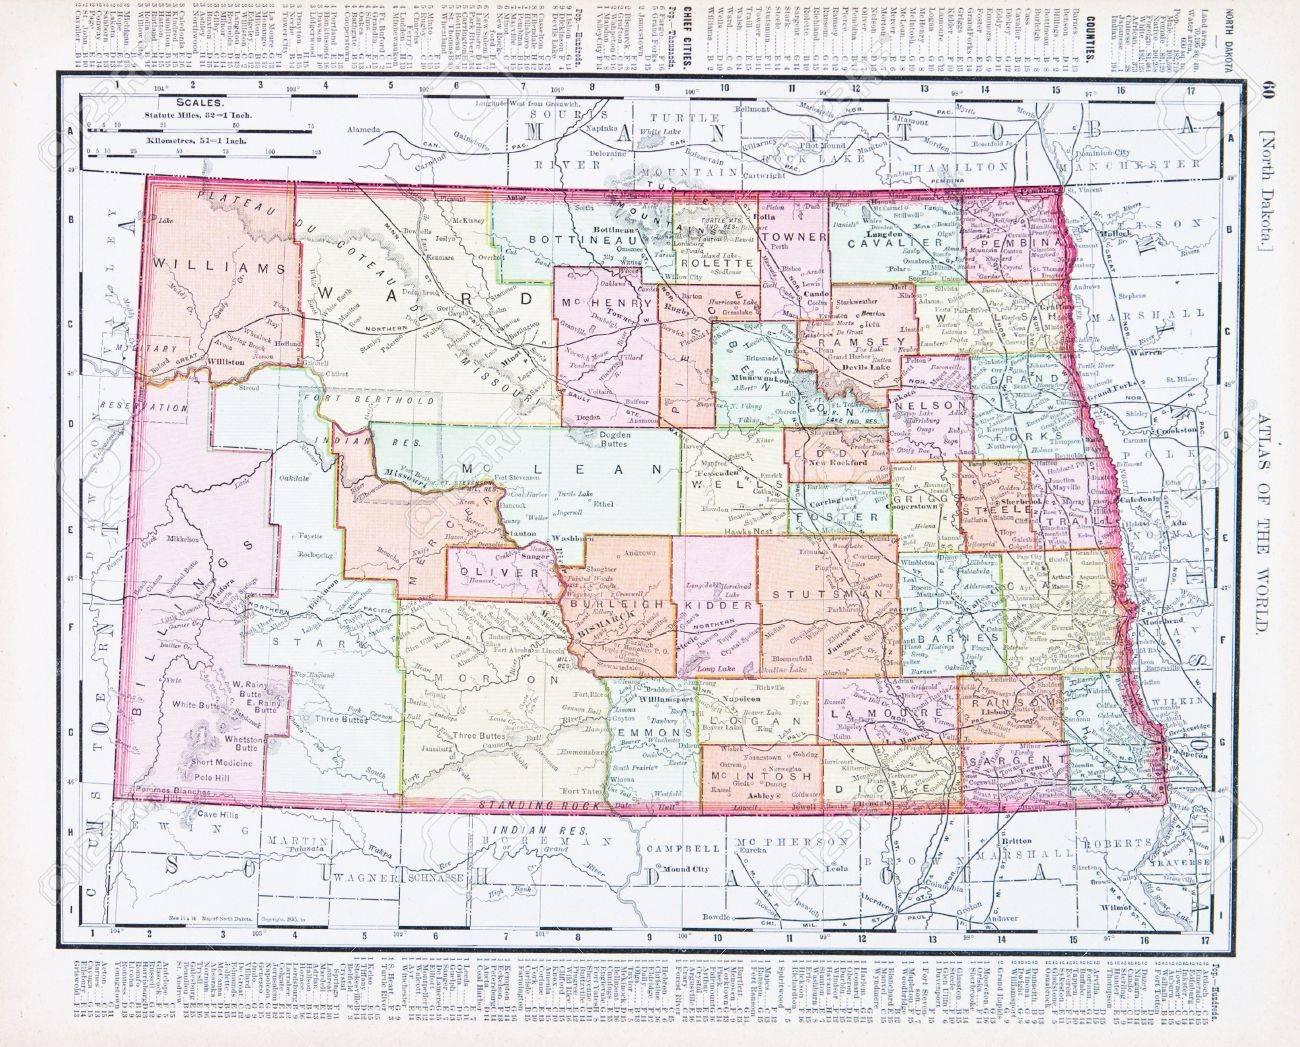 Vintage Map Of The State Of North Dakota United States - North dakota on the us map